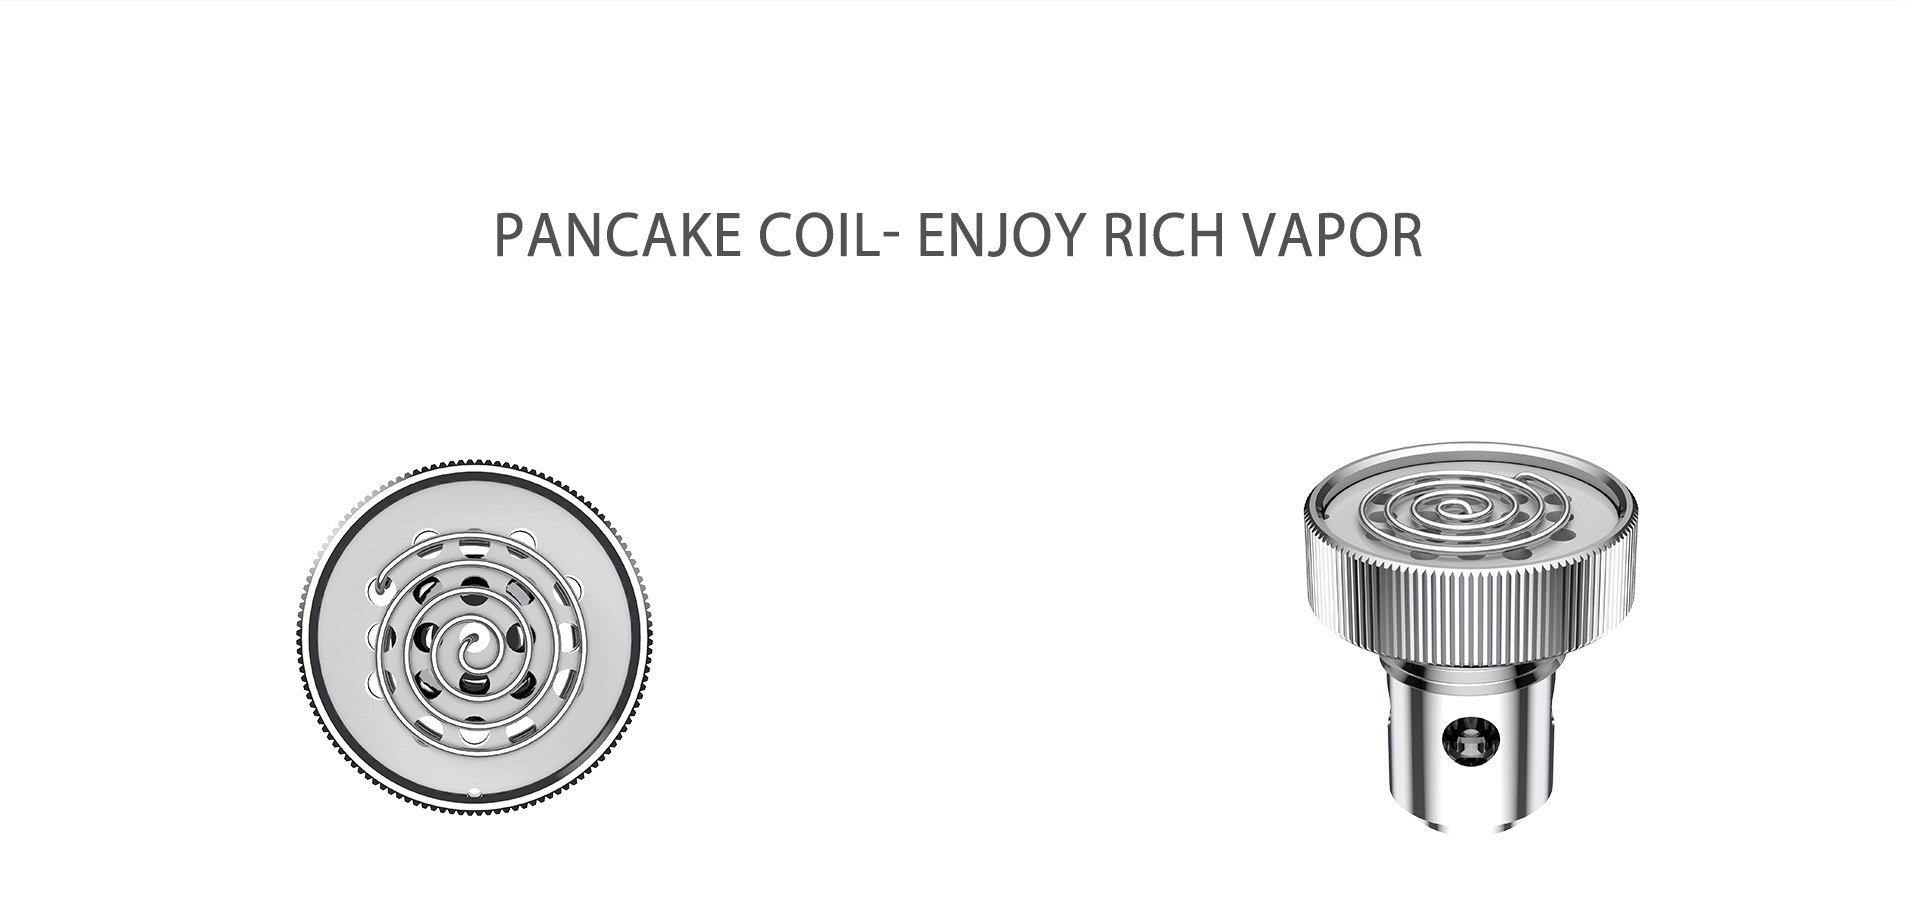 Yocan Evolve-D vaporizer pen 2020 version features pancake dual coil, enjoy rich vapor.